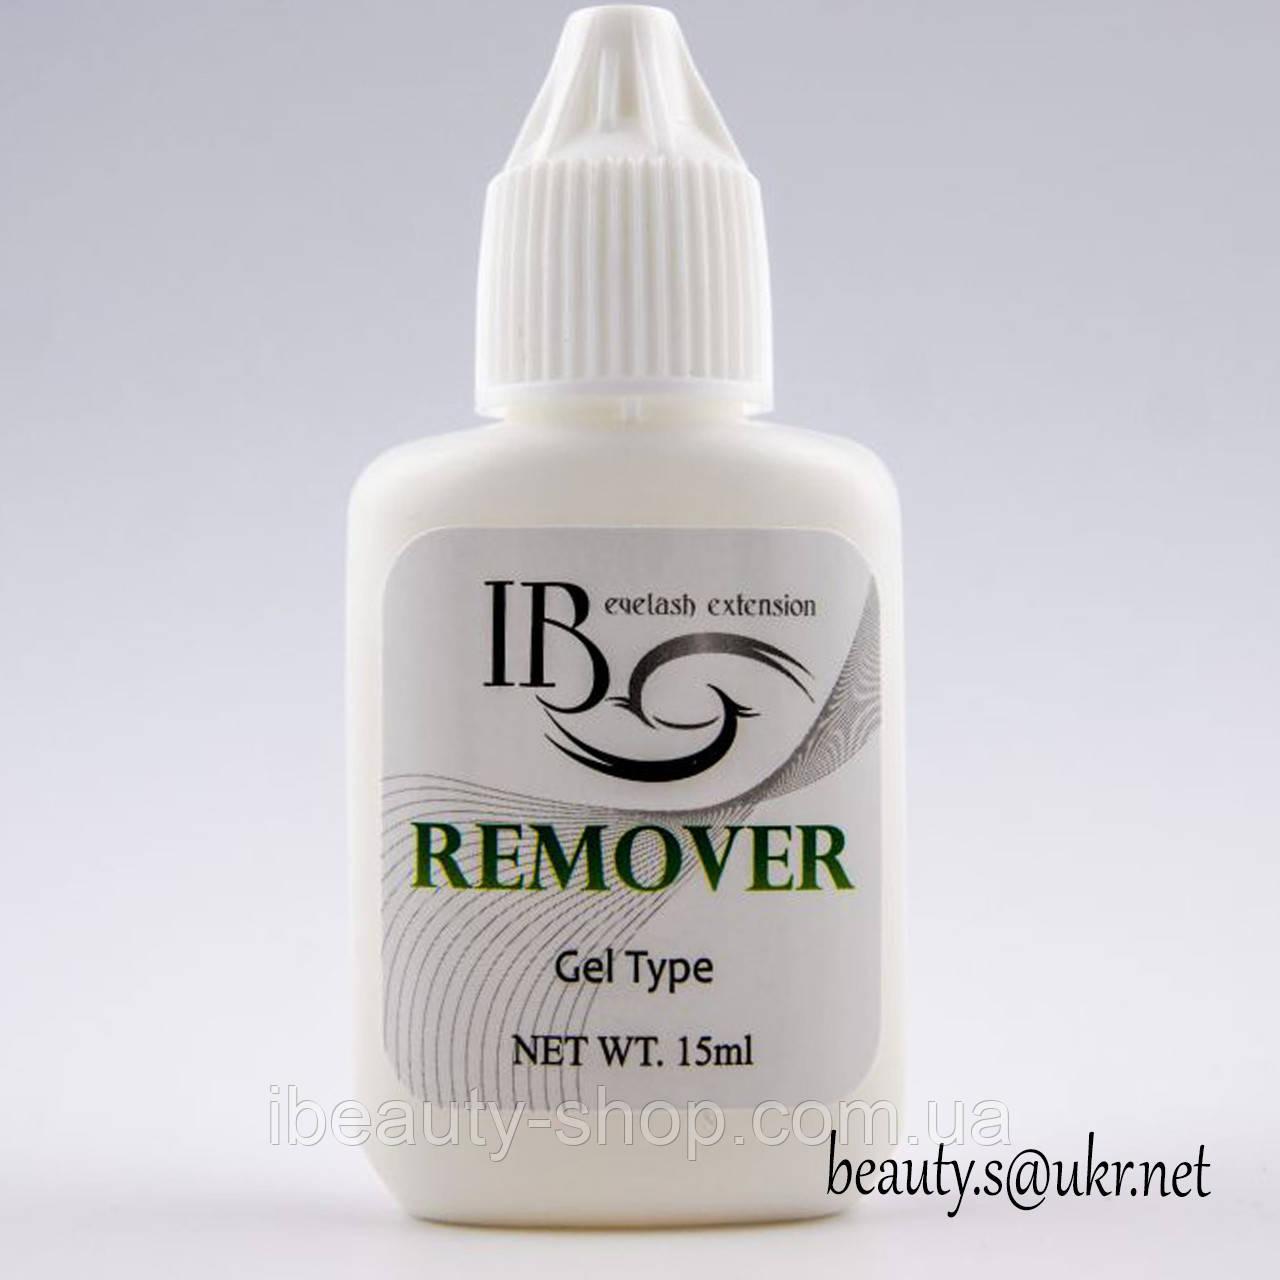 Ремувер гелевый Ай-Бьюти (Gel Remover I-Beauty),15мл